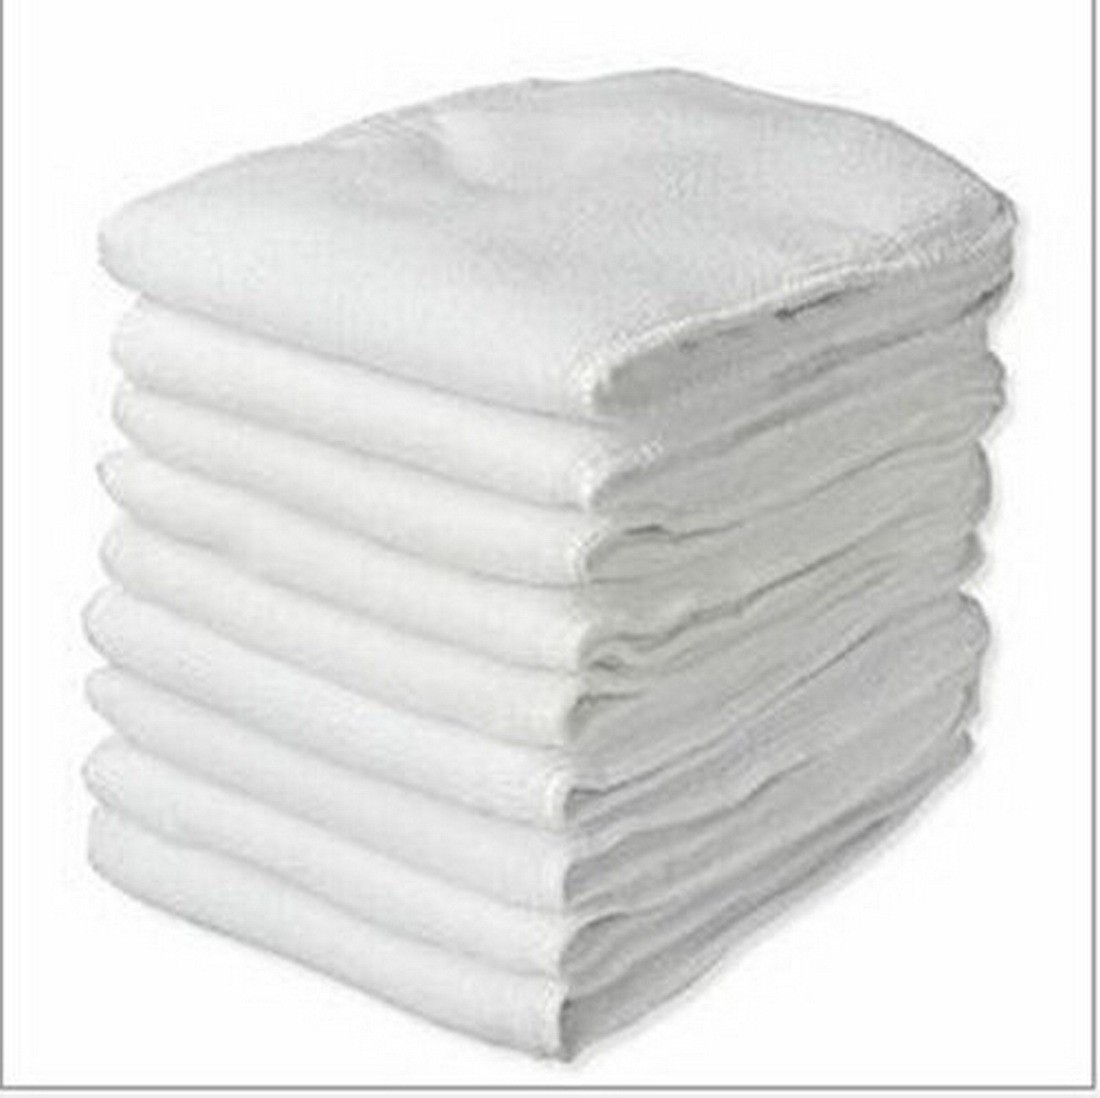 EIO Newborn Infant Cloth Diaper Cover Washable Nappy - S(6 Pieces)